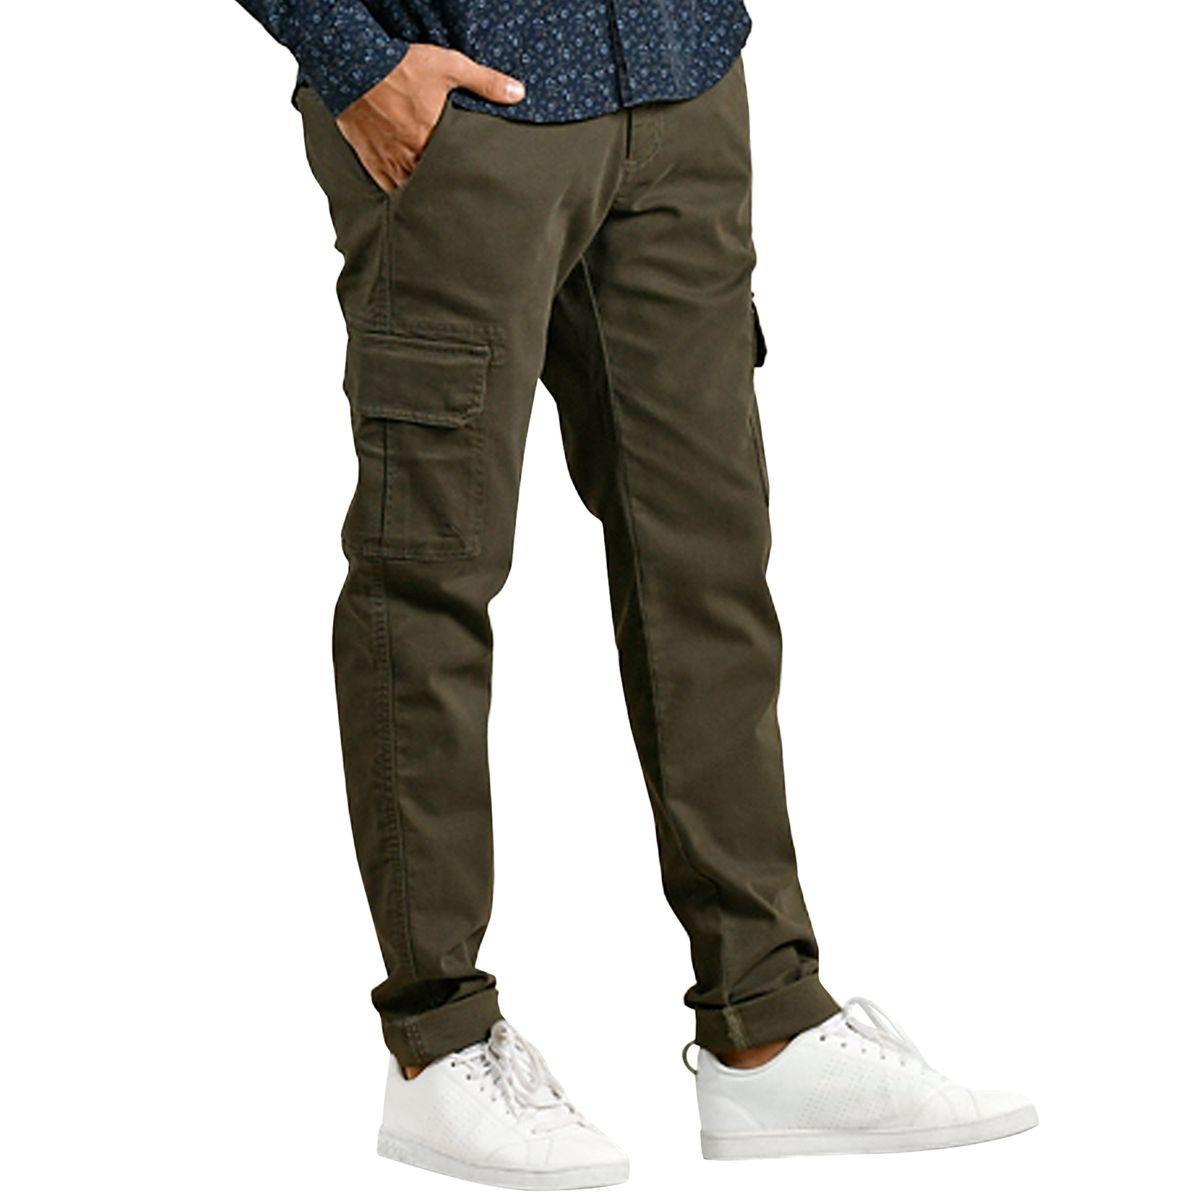 Pantalon cargo style casual chic